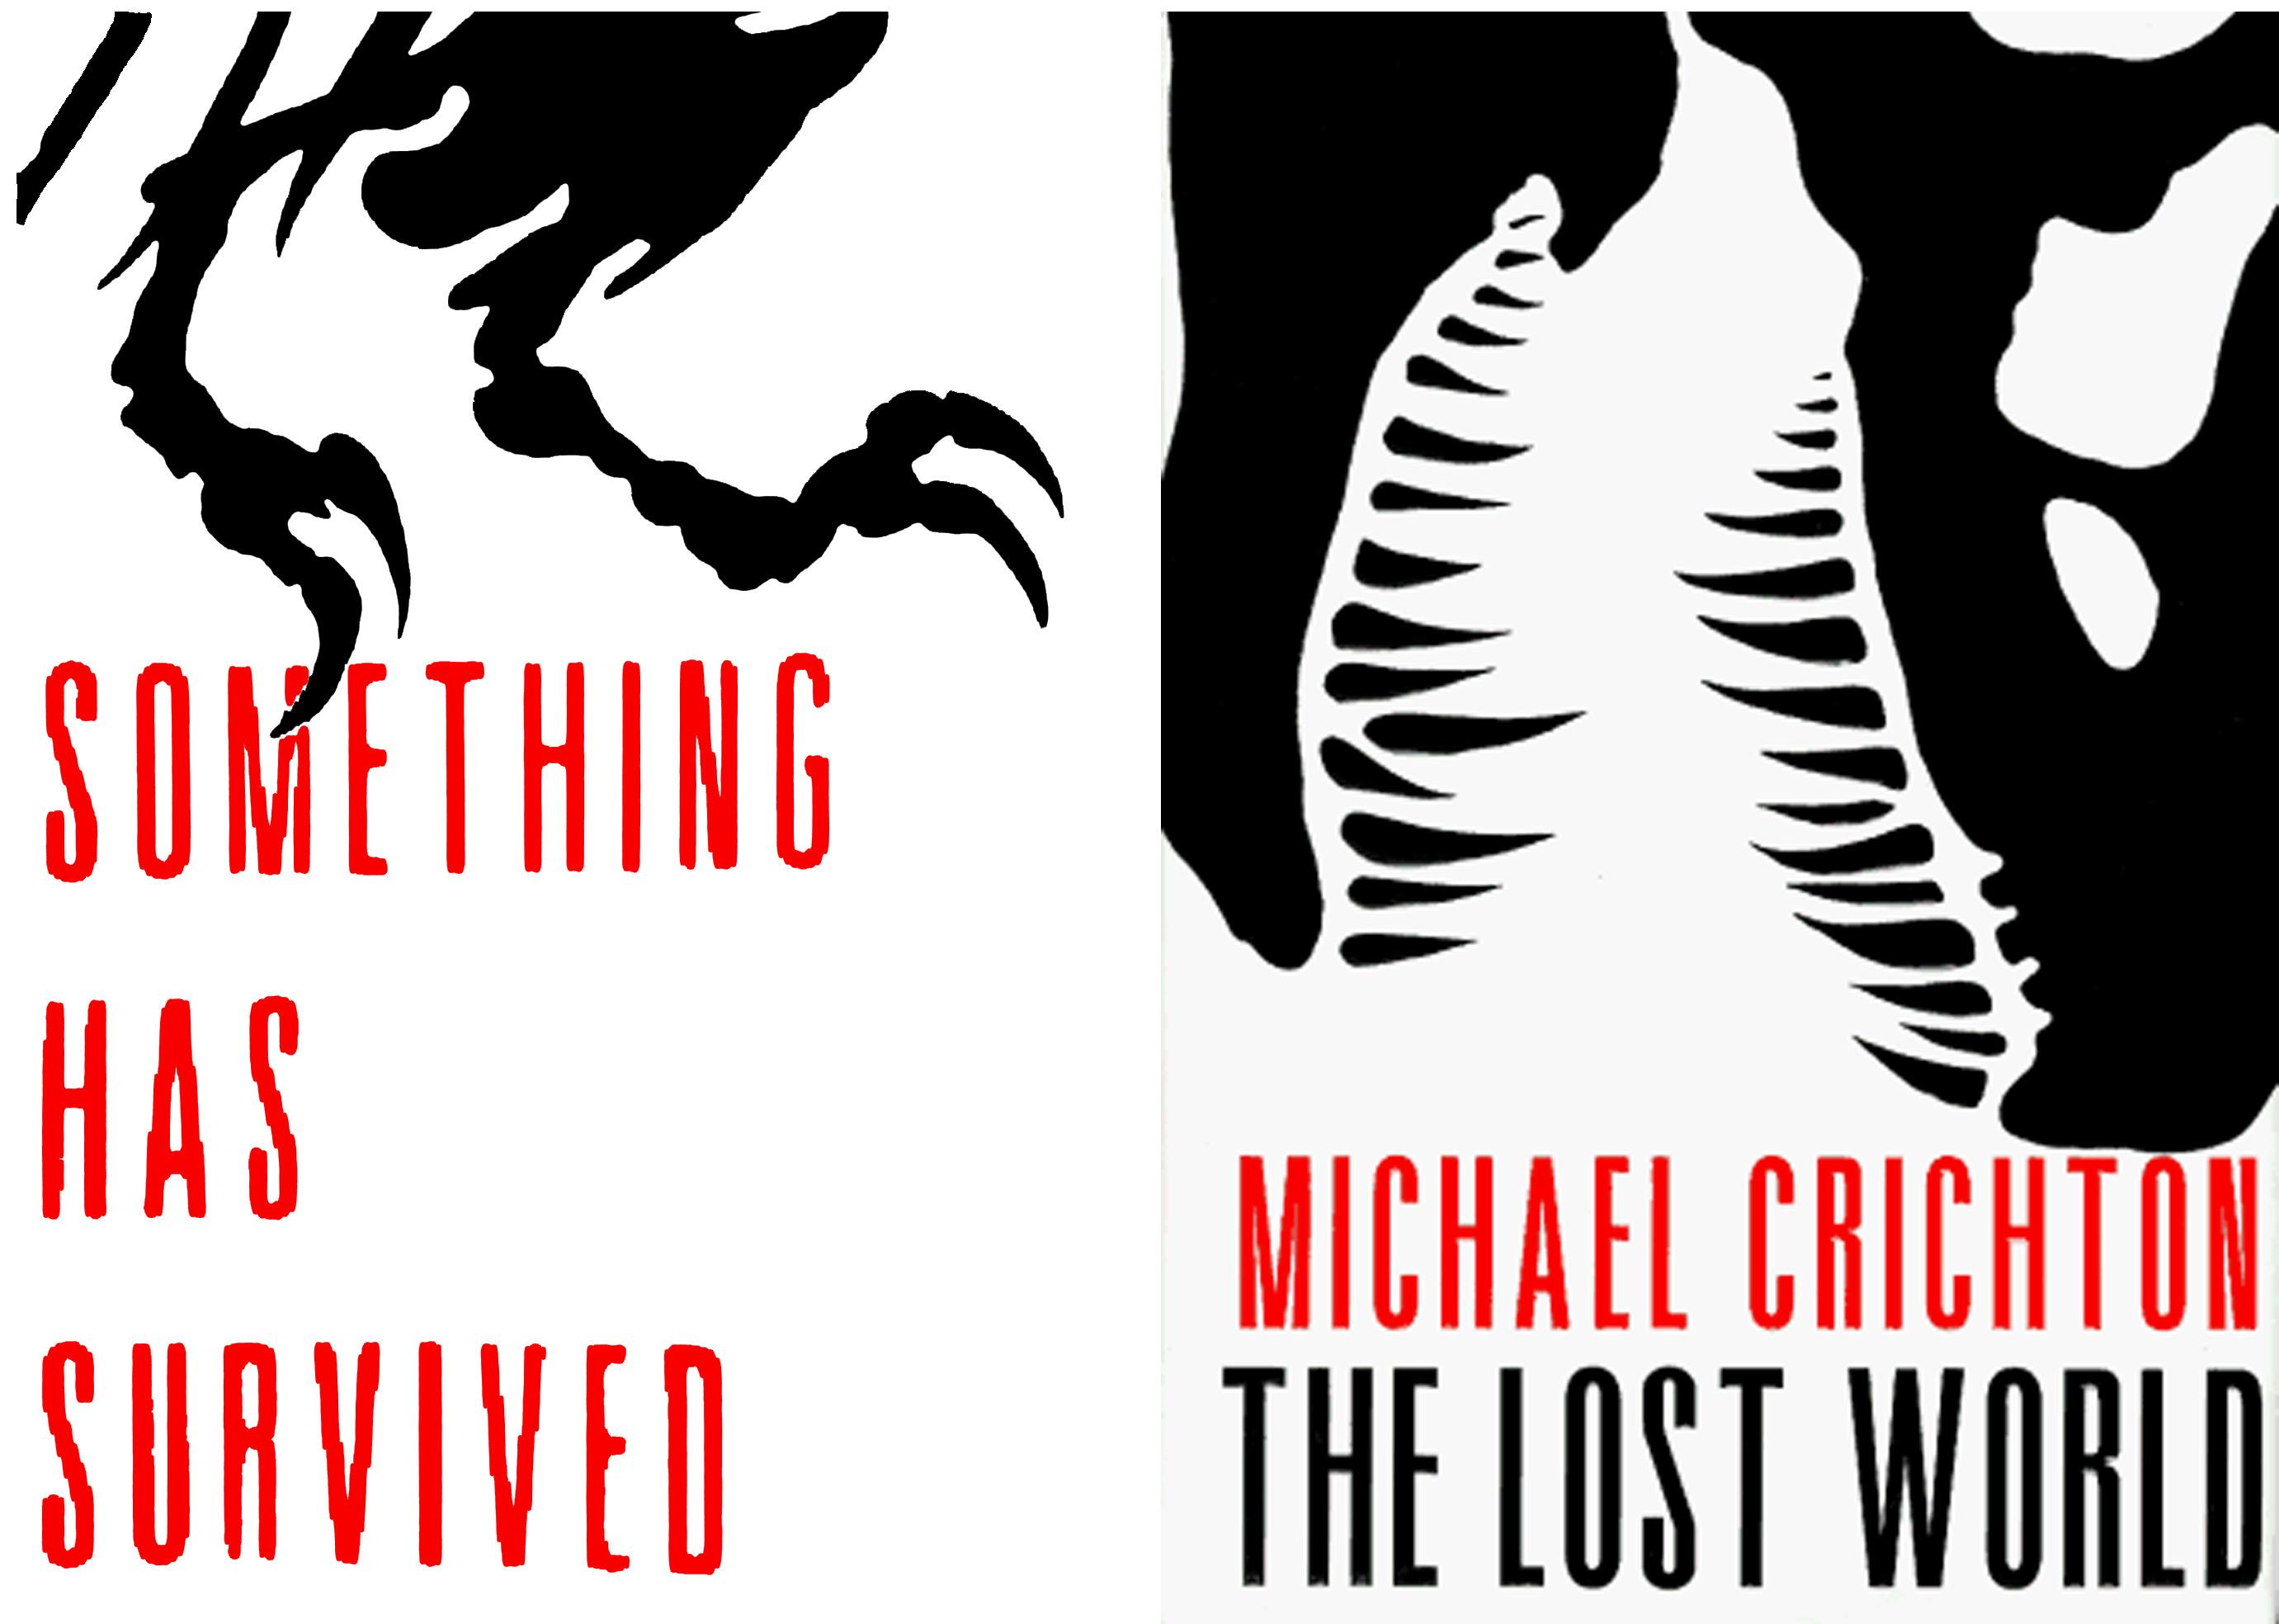 Get ready for a new dinosaur novel from Michael Crichton